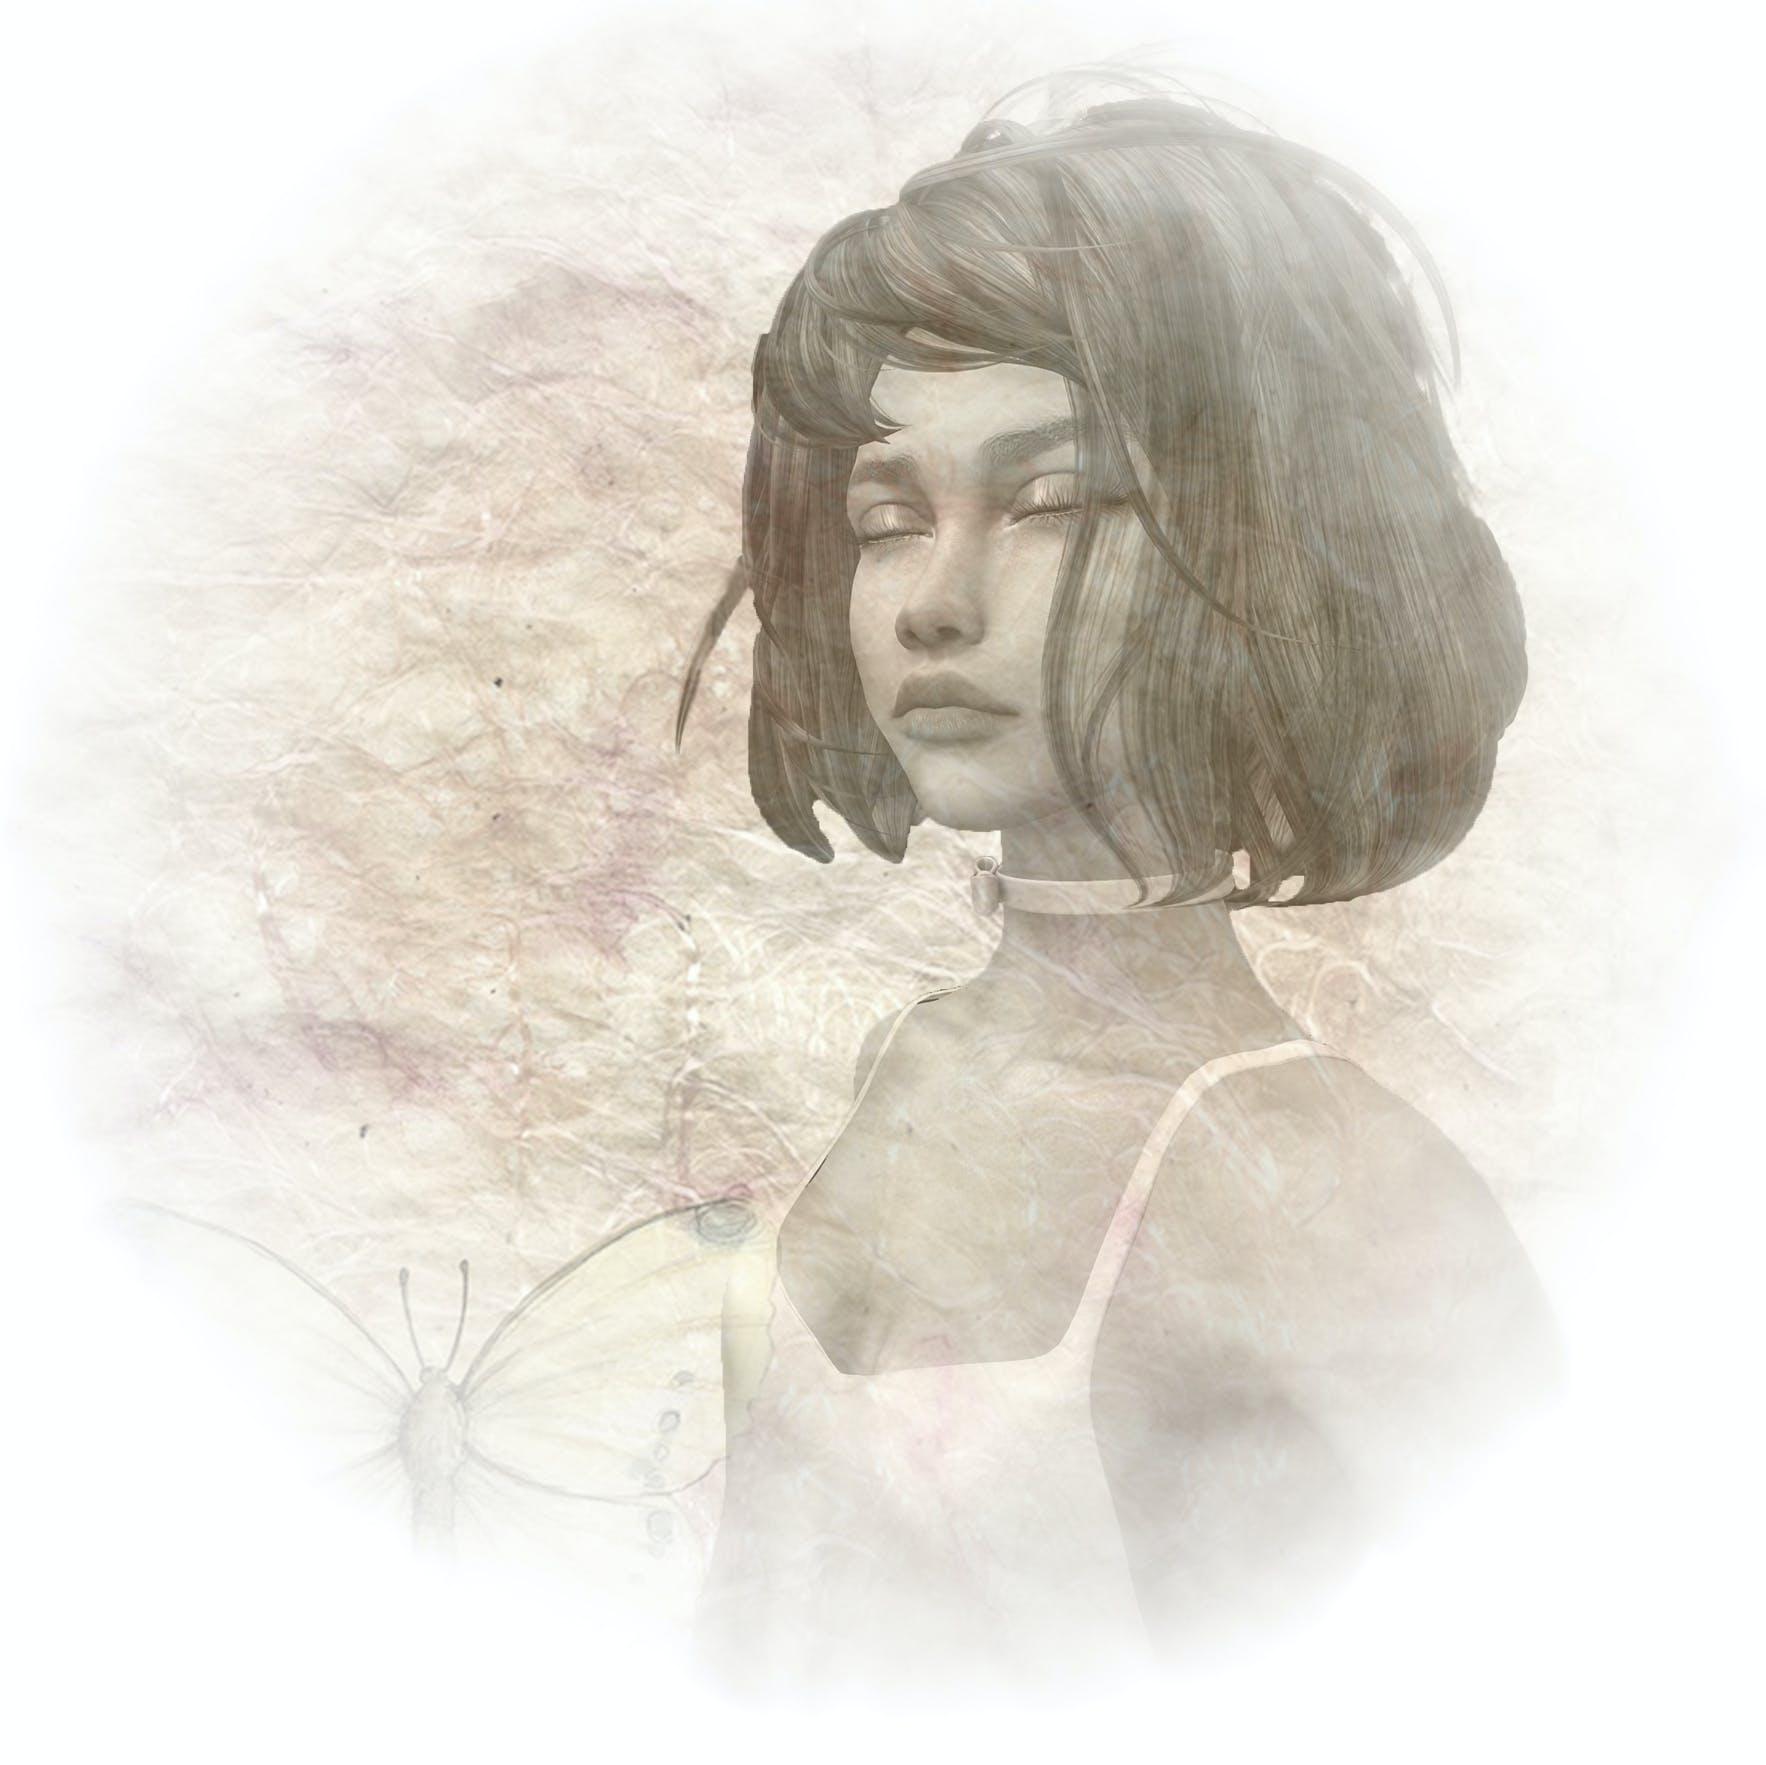 black and white, girl, portrait